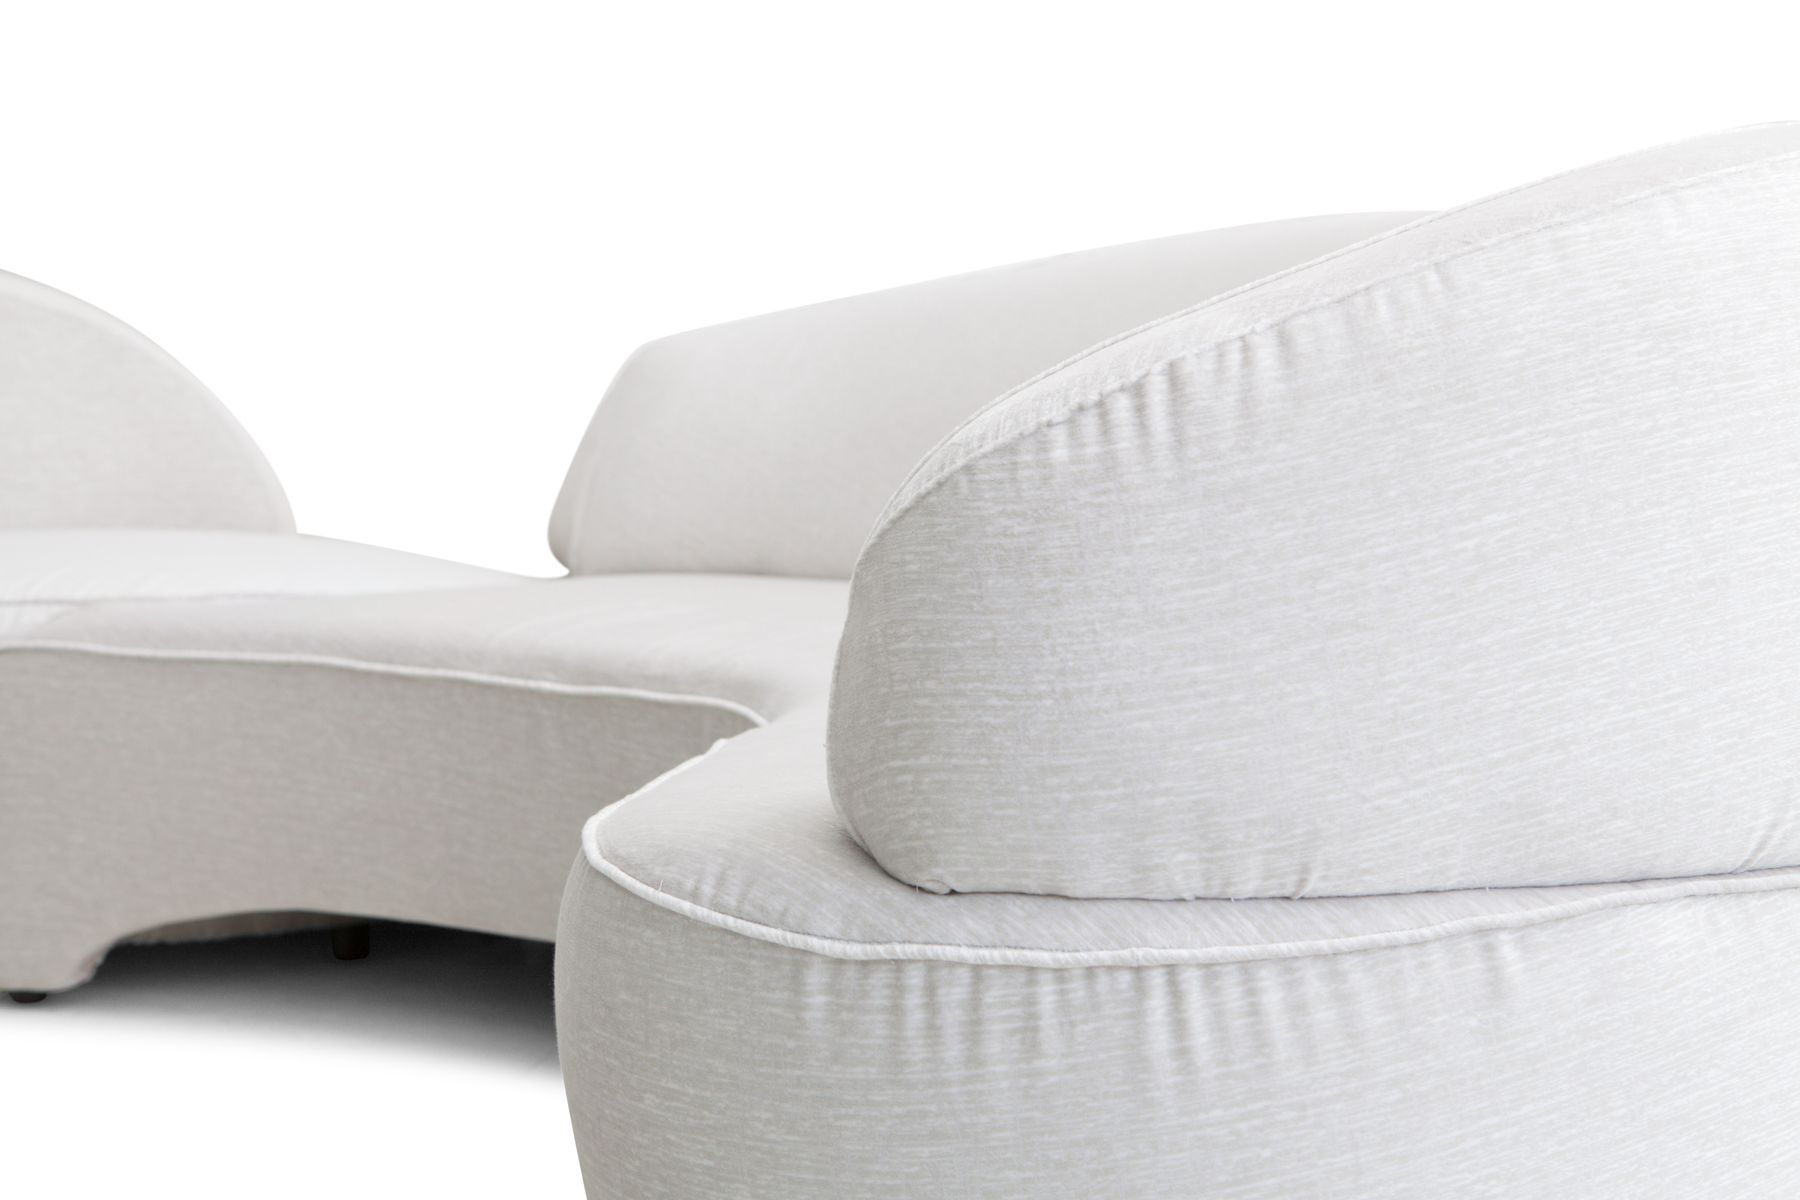 Vintage et Sectional Sofa by Vladimir Kagan for Roche Bobois